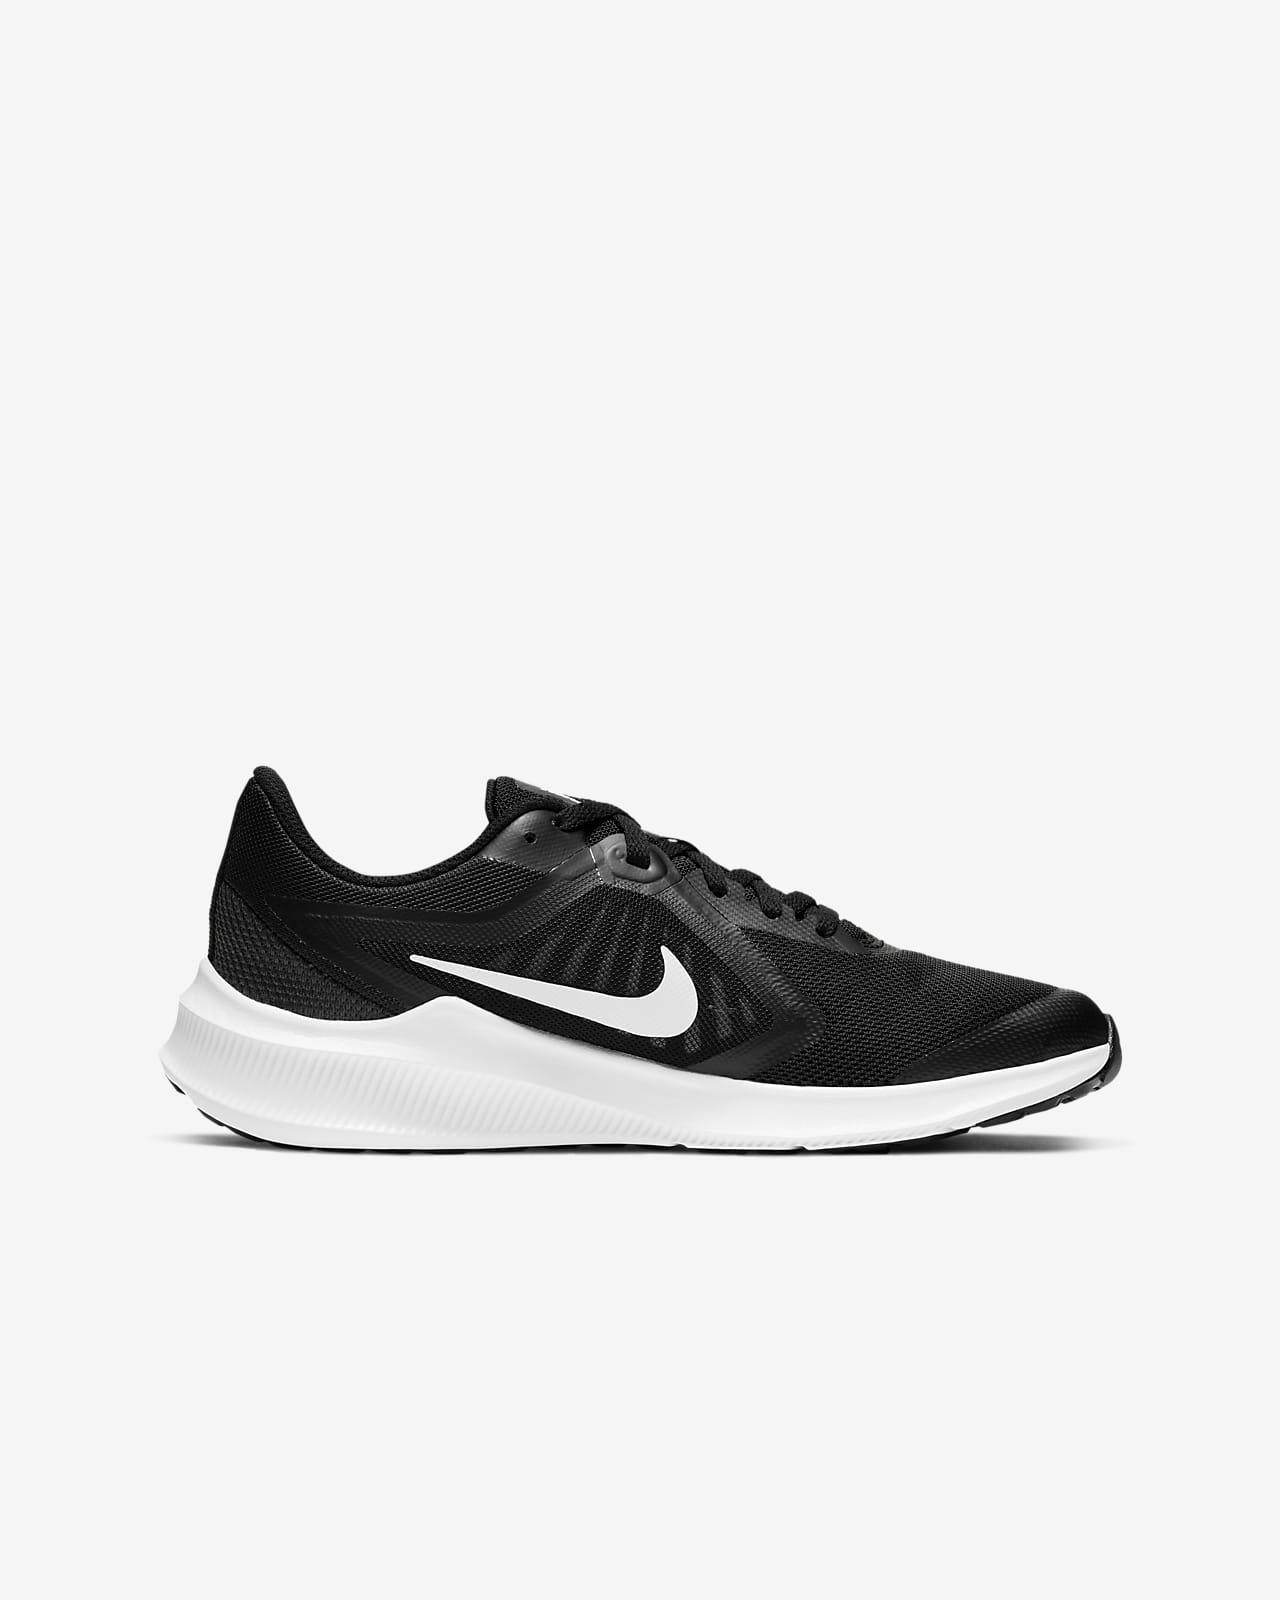 Nike Downshifter 10 Older Kids' Running